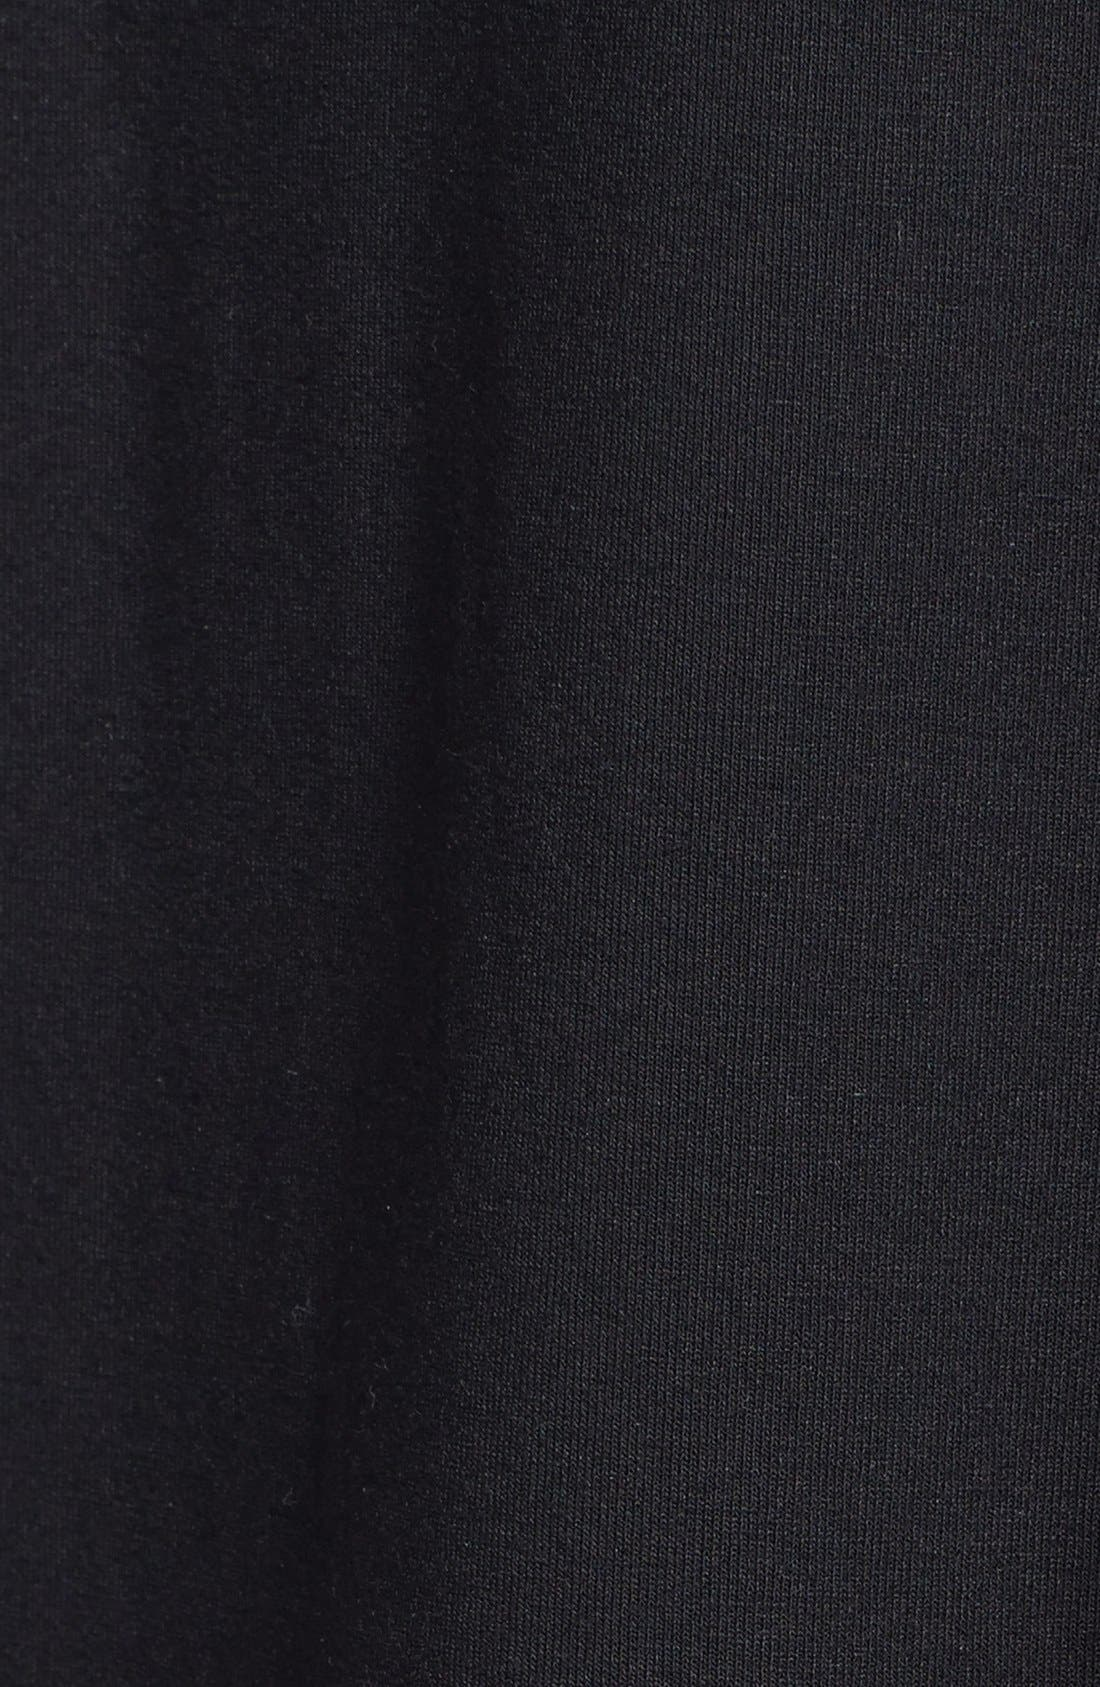 Alternate Image 3  - Eileen Fisher Lace Hem Scoop Neck Jersey Shift Dress (Plus Size)